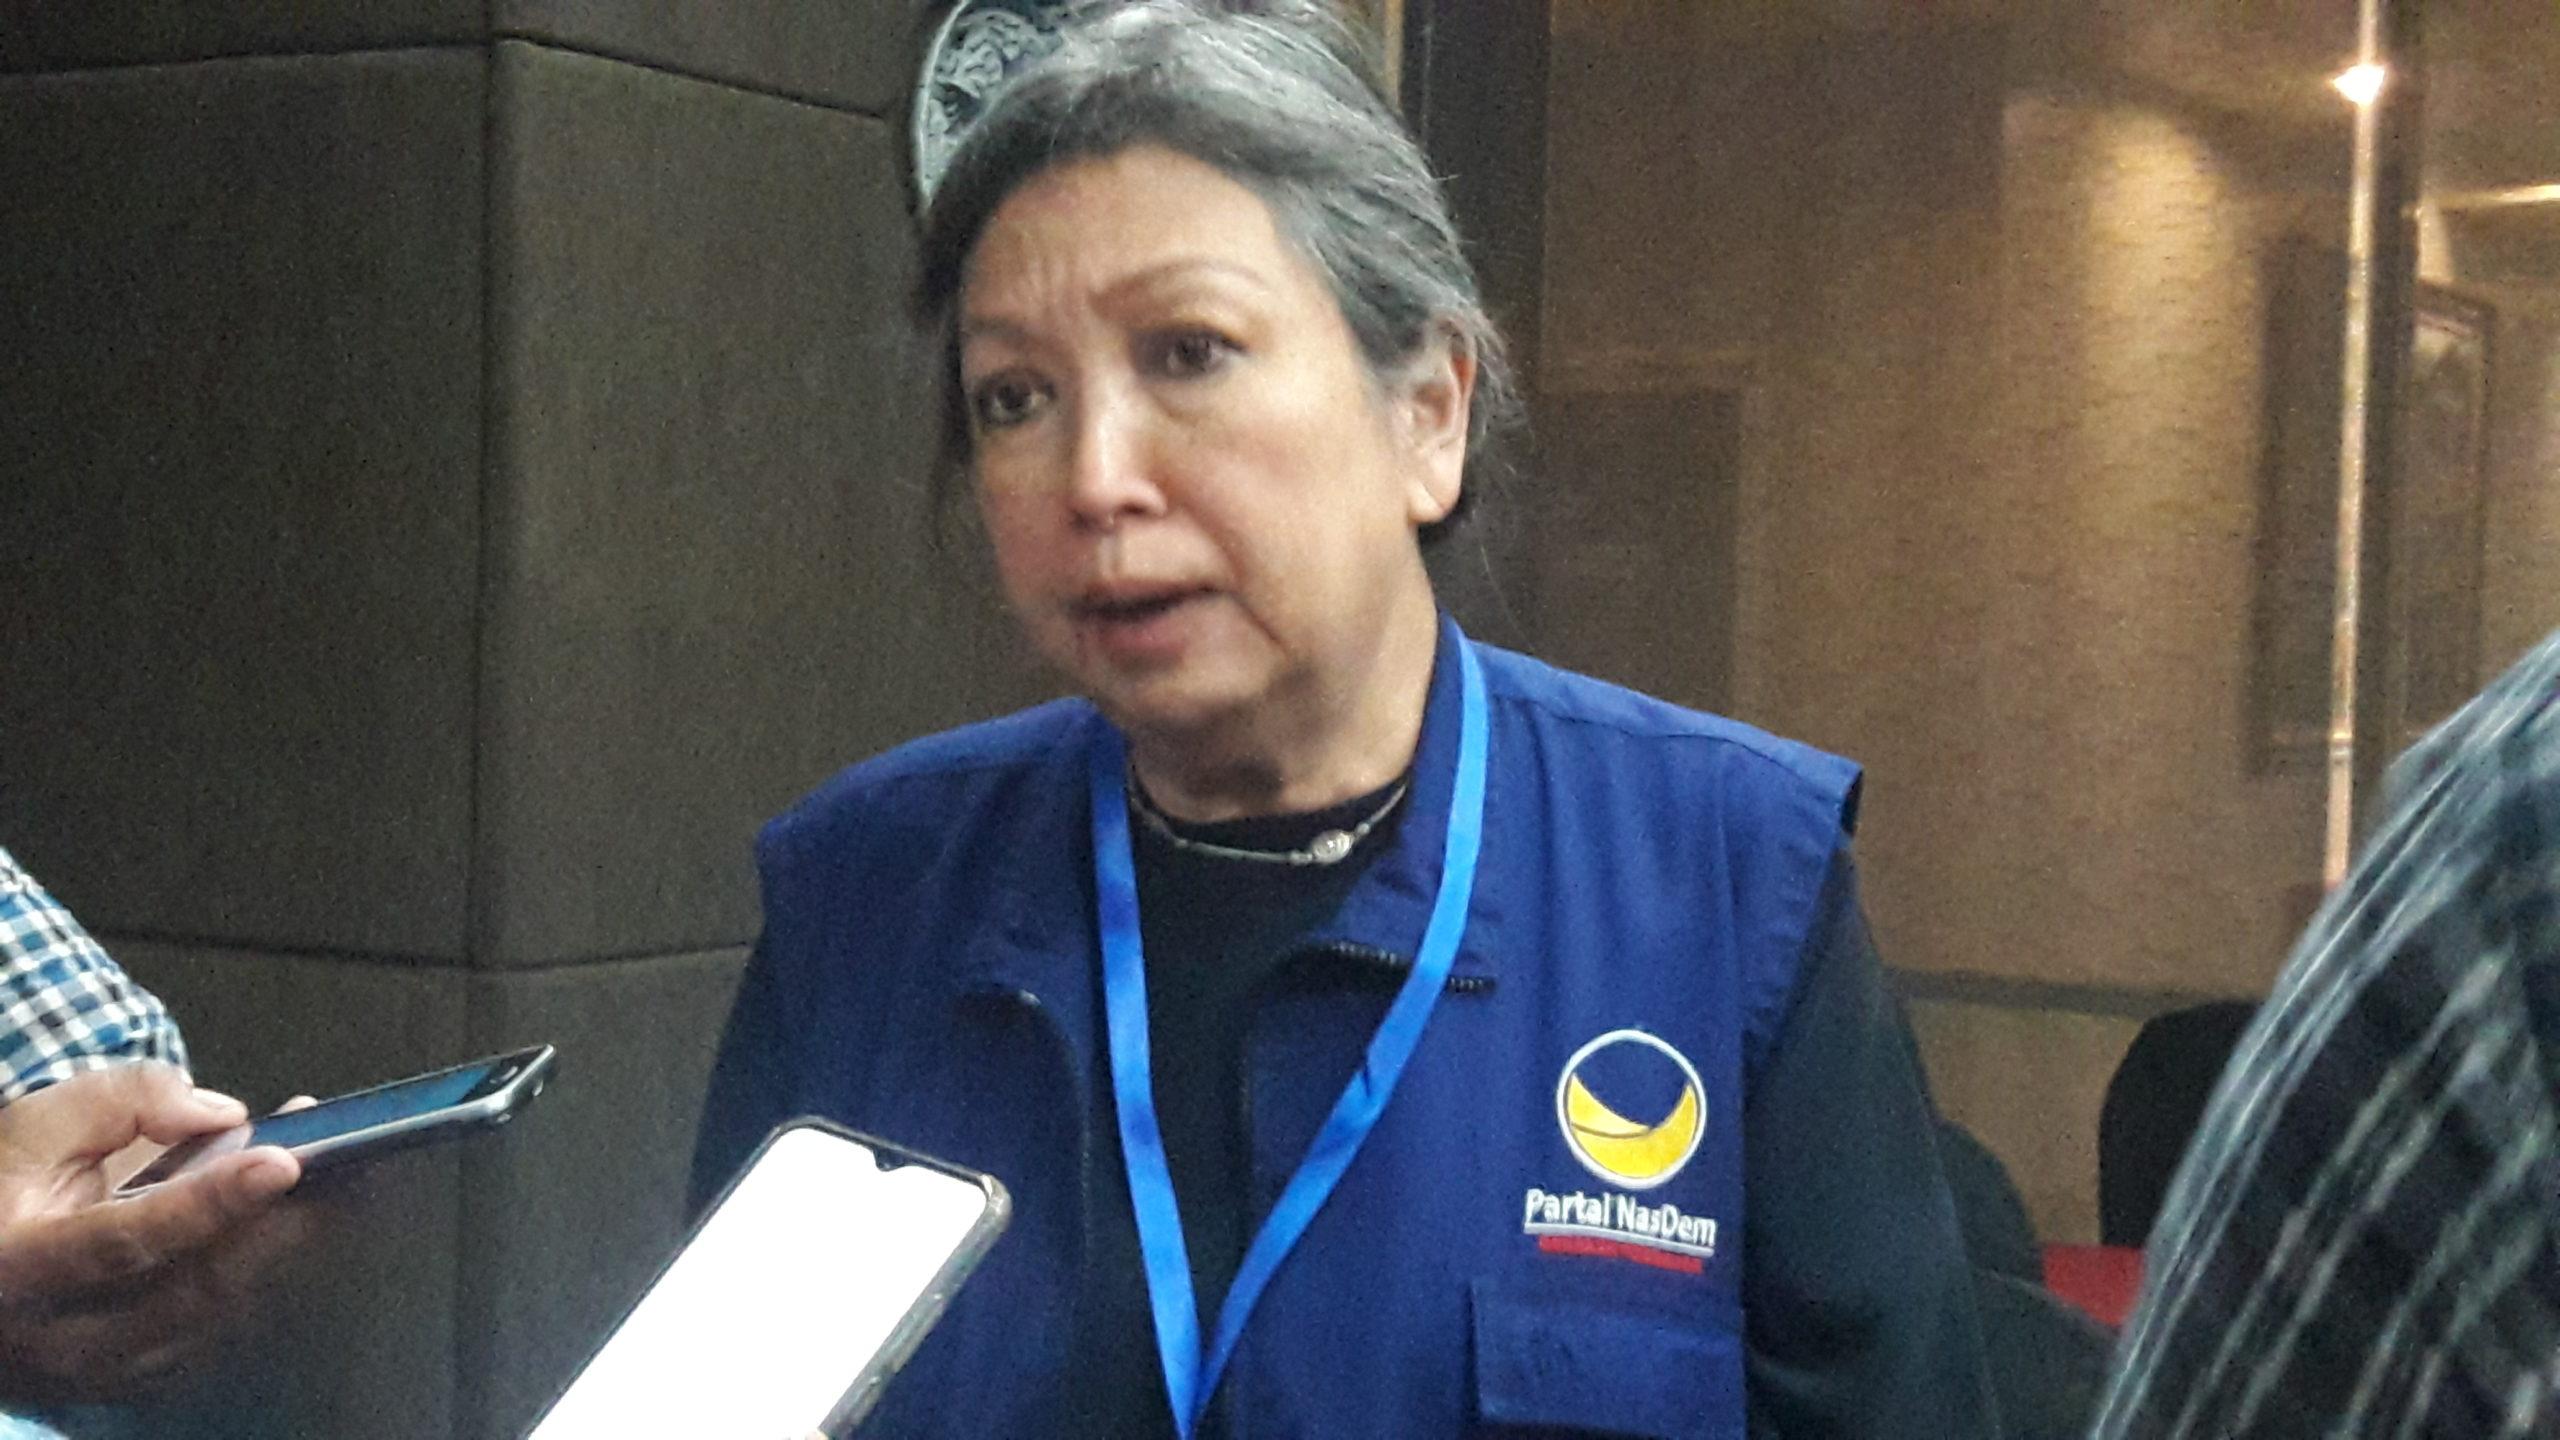 Ketua Dewan Pimpinan Wilayah (DPW) Partai NasDem Provinsi Jawa Timur Sri Sajekti Sudjunadi saat ditemui di Surabaya, Minggu (8/3/2020).